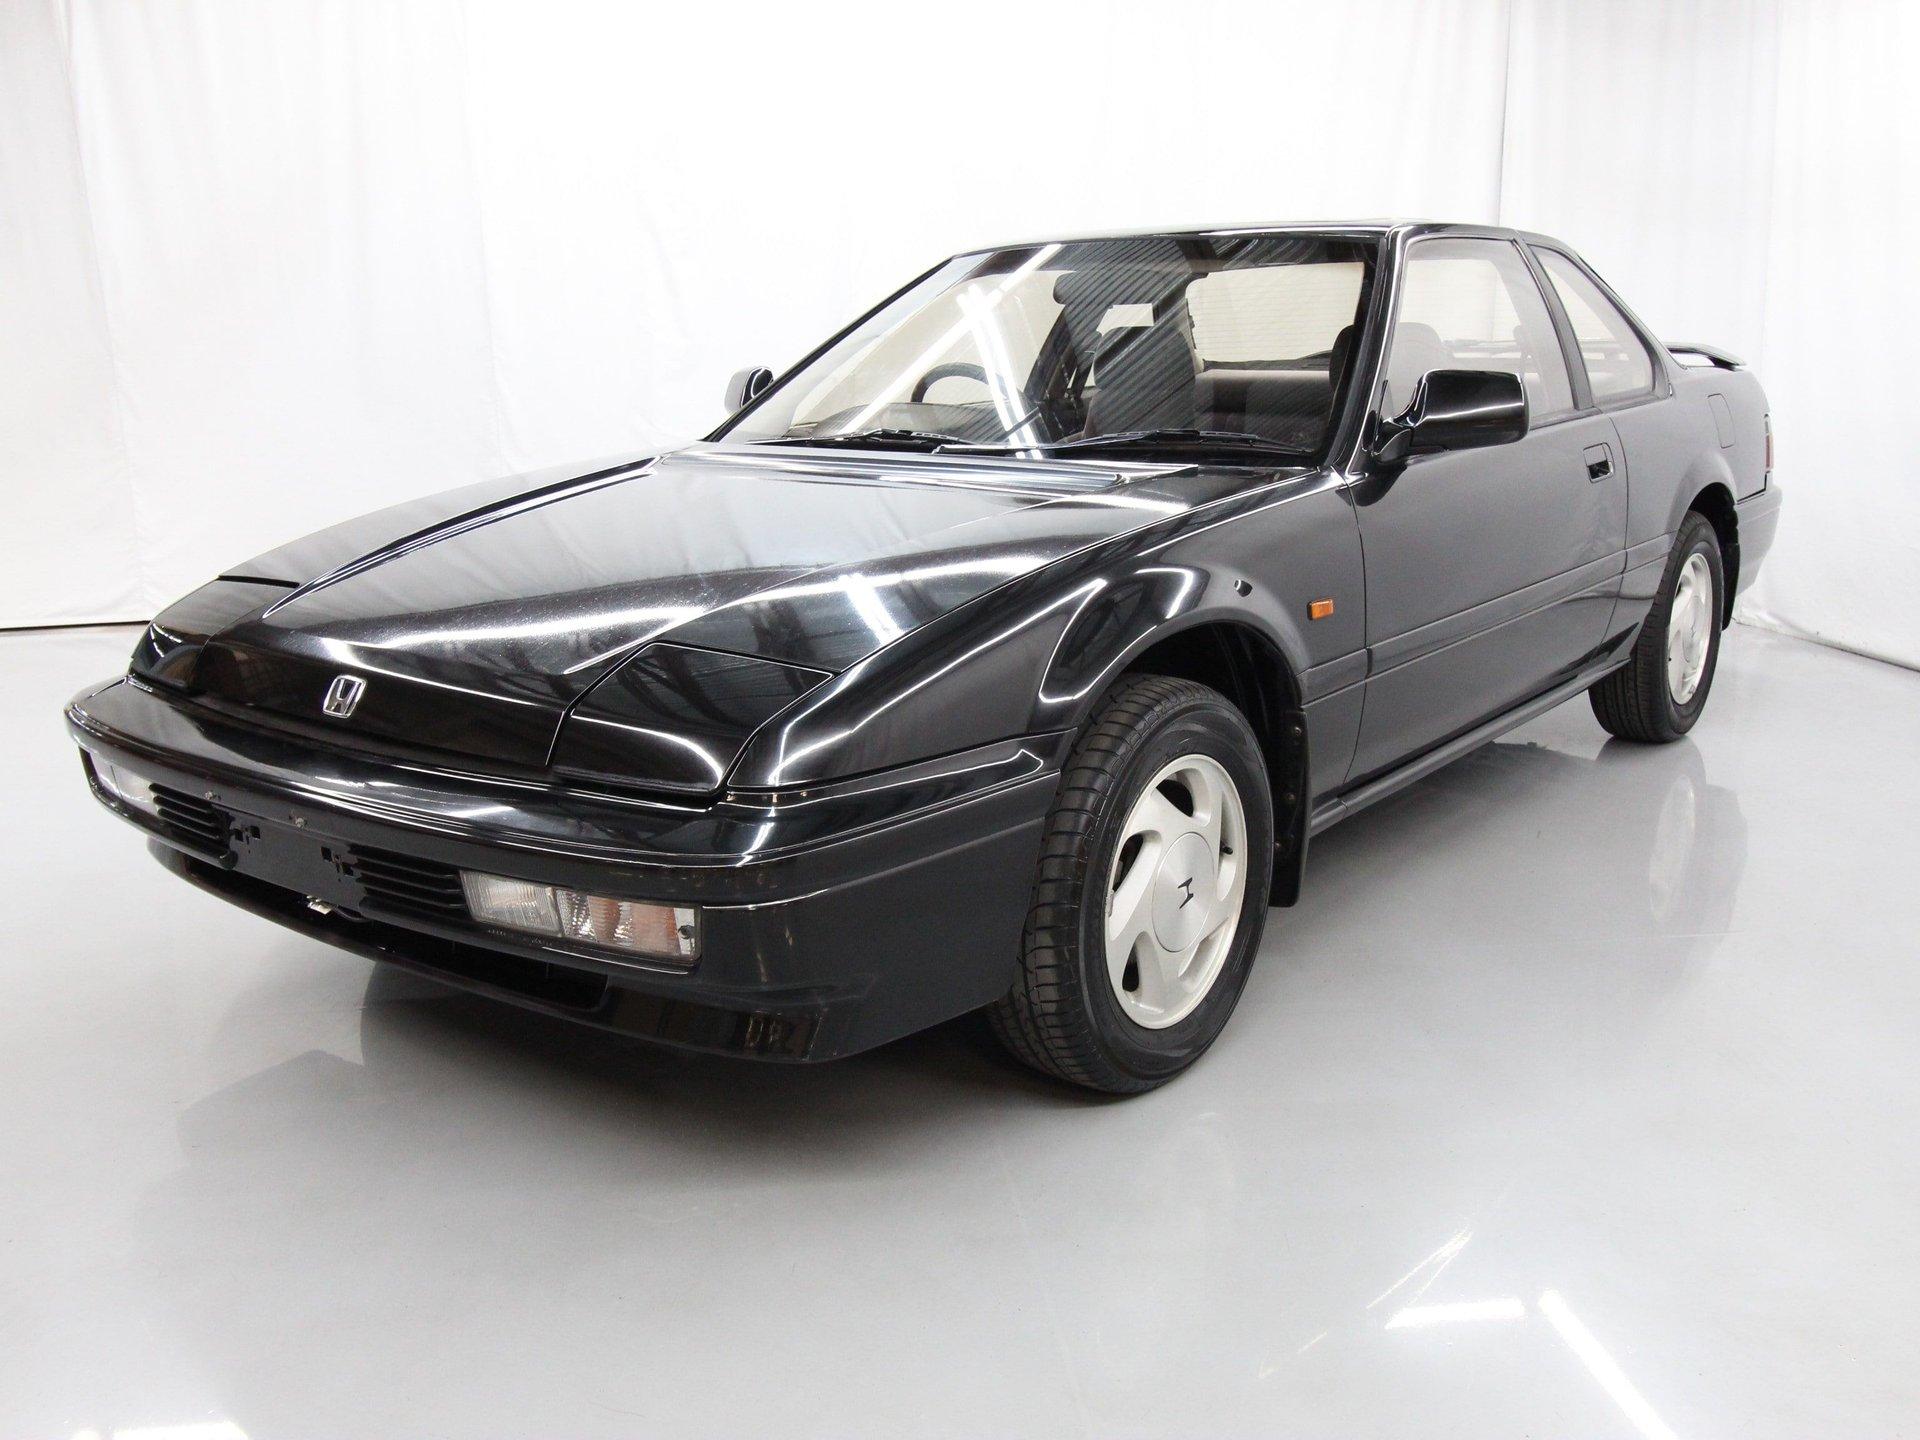 1990 Honda Prelude